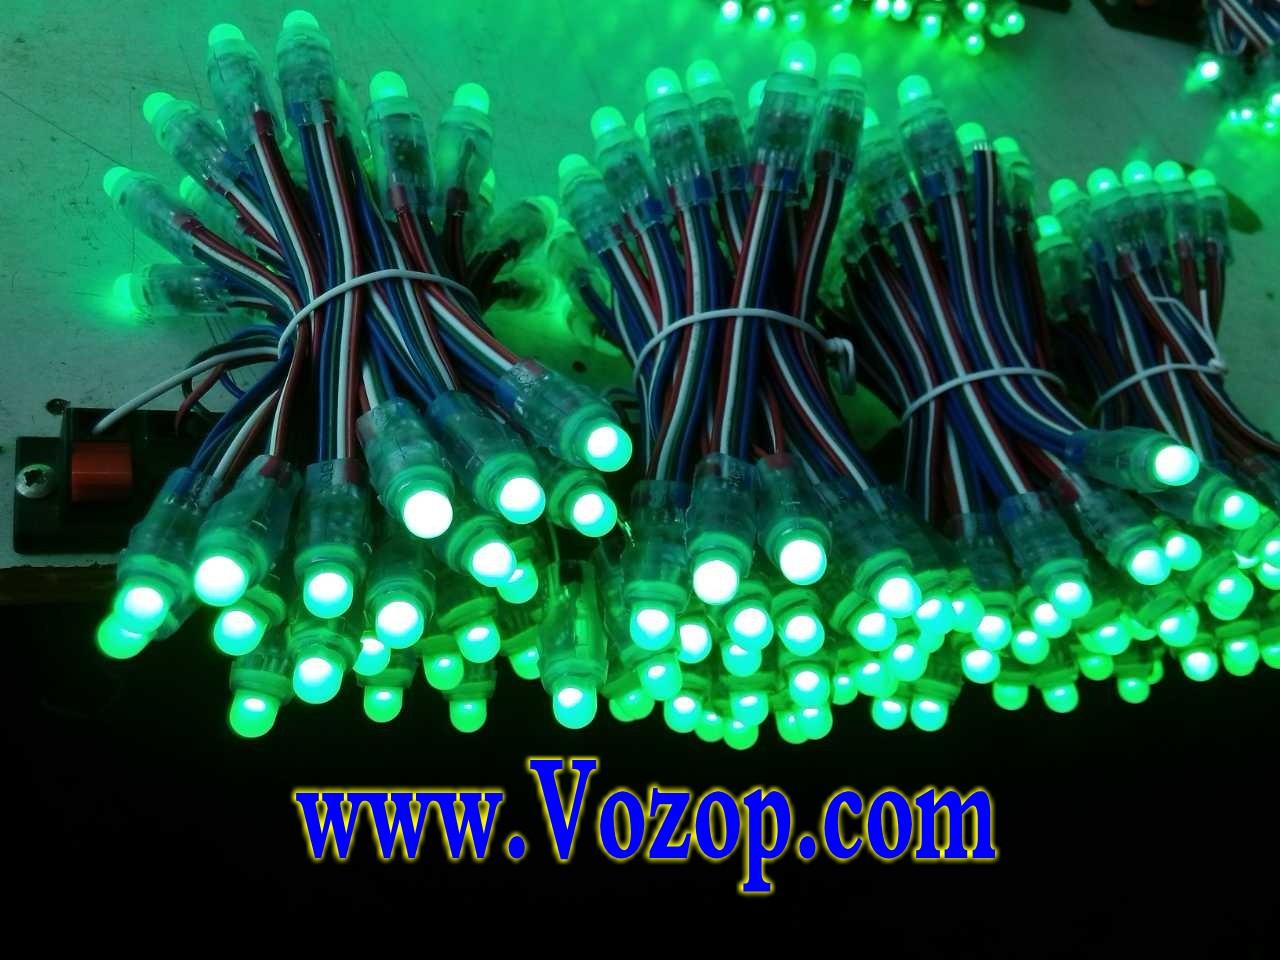 6803_IC_RGB_LED_Pixel_Module_Digital_RGB_LED_Module_outdoor_lighting